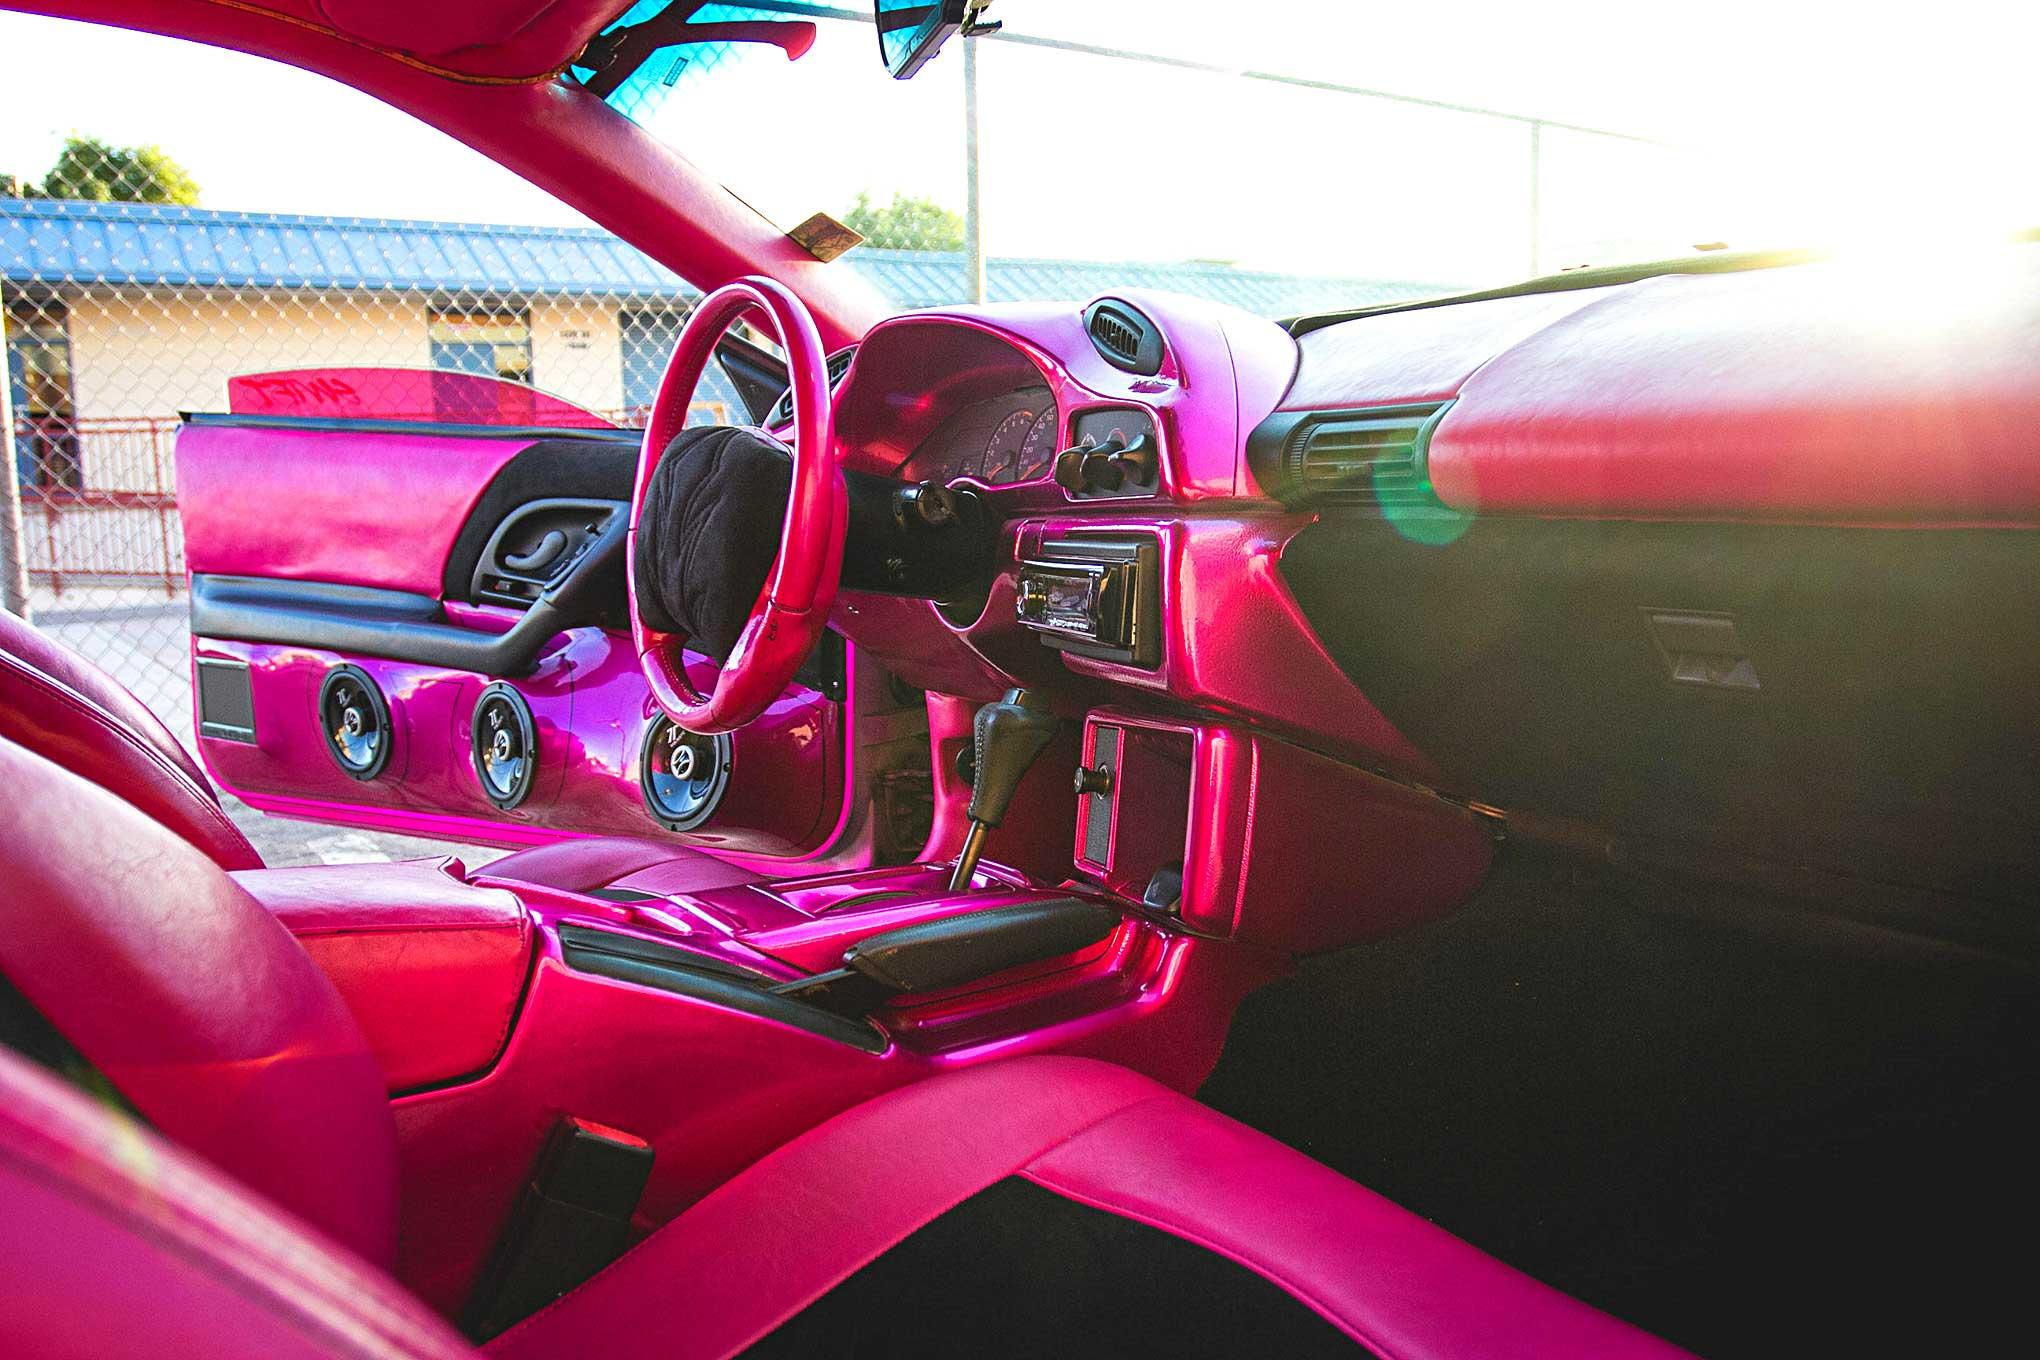 1995 Chevrolet Camaro Pink Vinyl Interior Lowrider